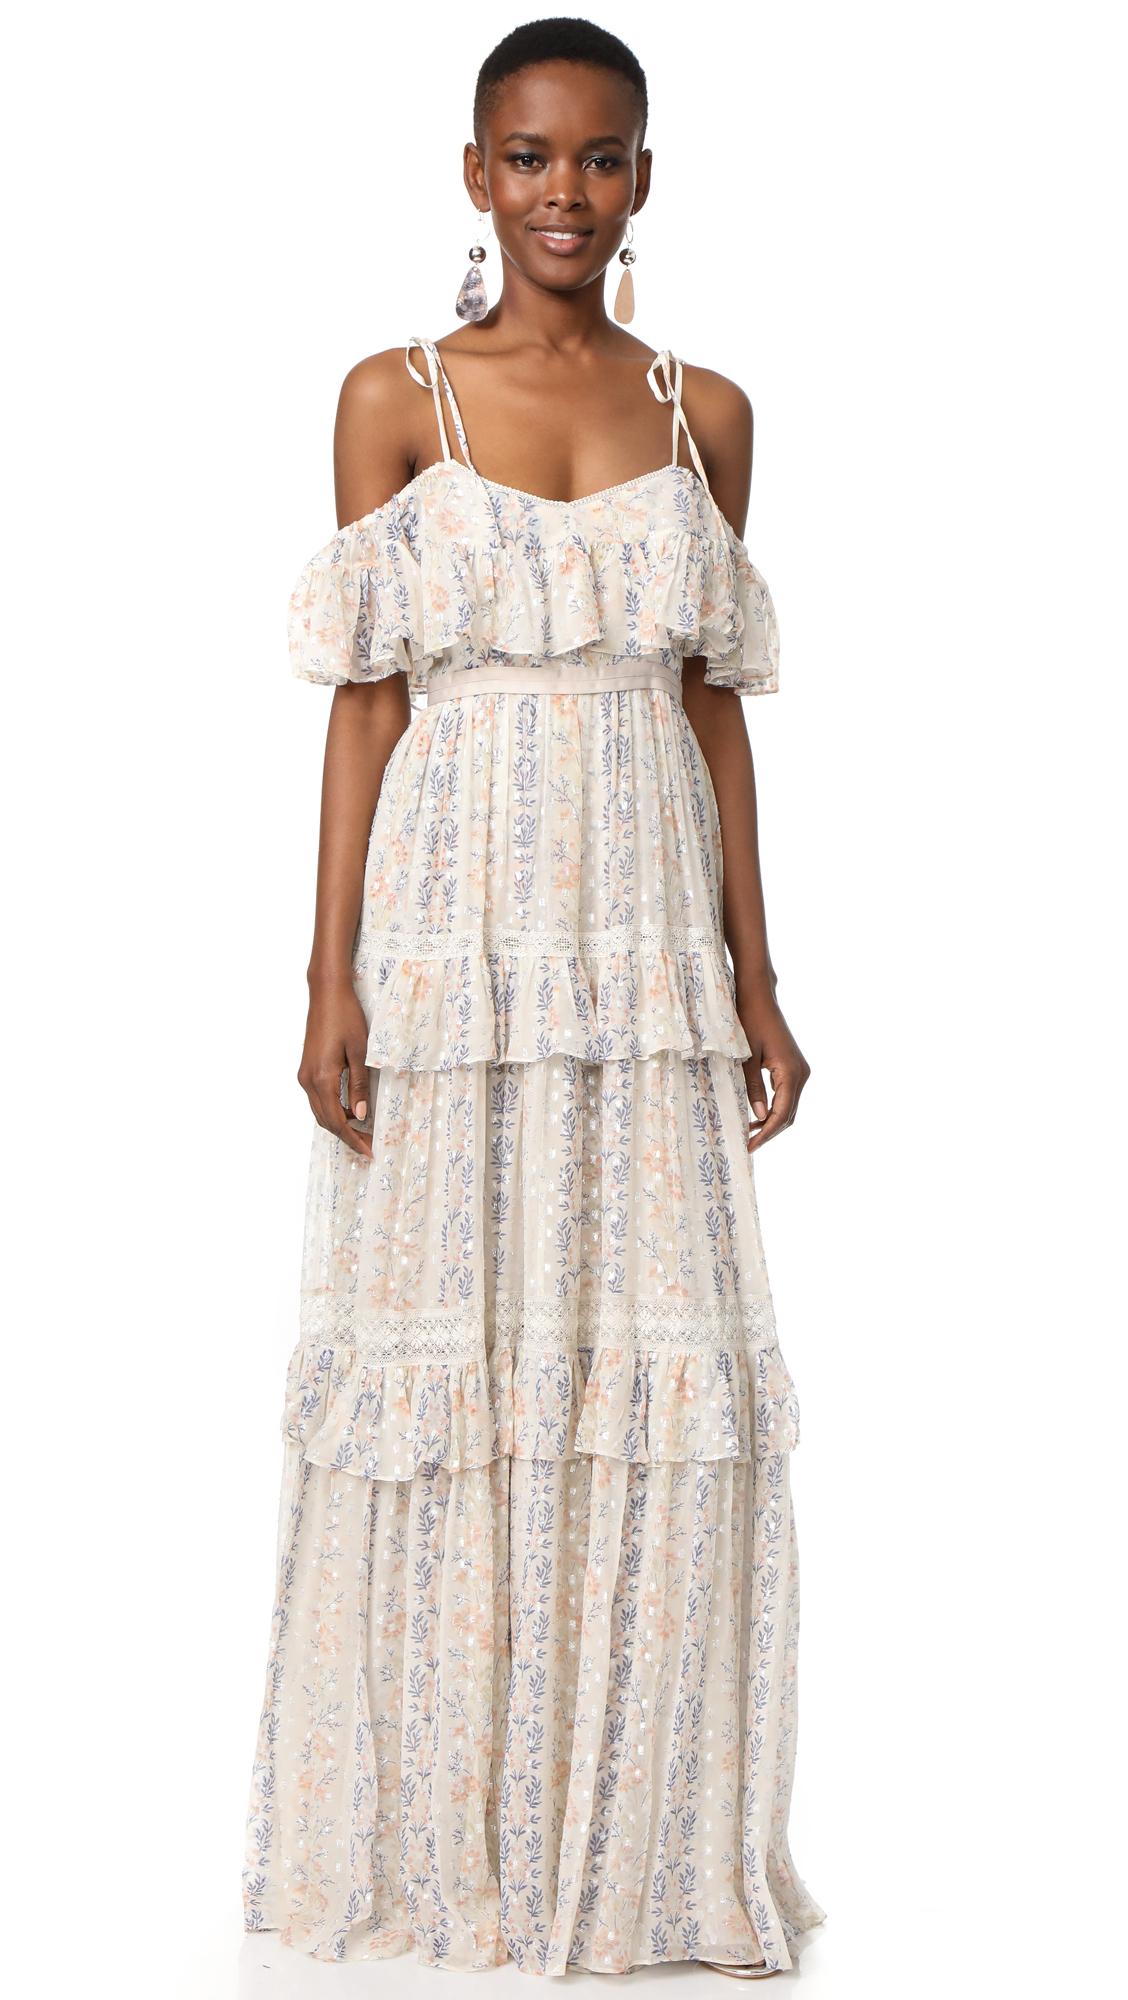 Chung Floral Dress 5 Alternatives To Jamie Chung S Suno